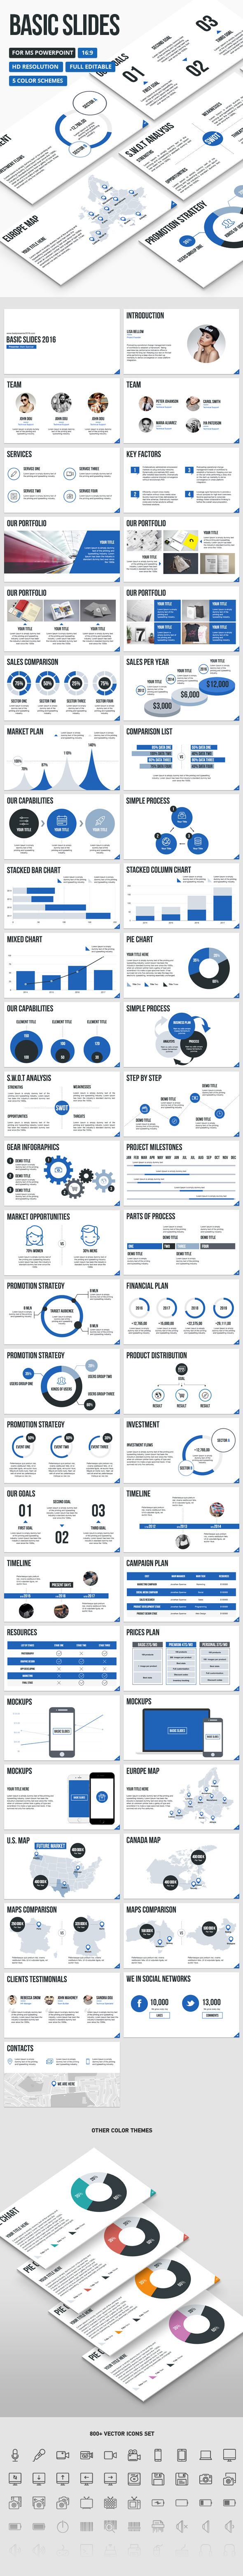 Basic Slides - PowerPoint Presentation Template